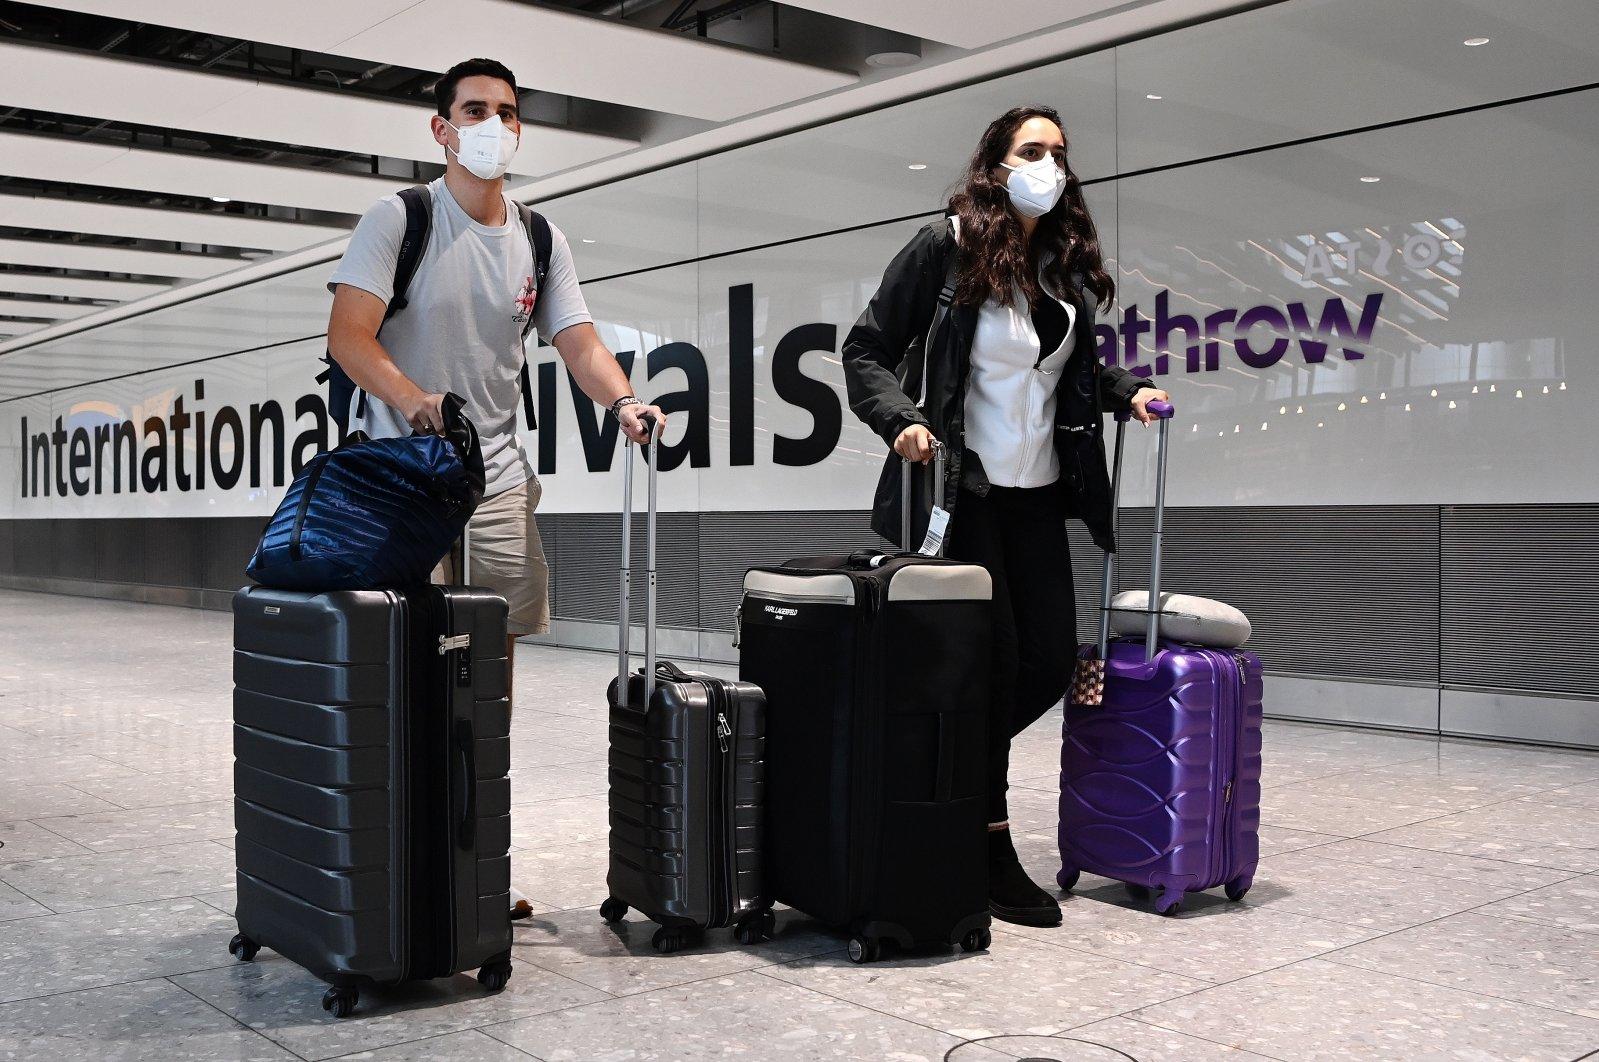 Travelers arrive at Heathrow Airport in London, U.K., July 31, 2021. (EPA Photo)